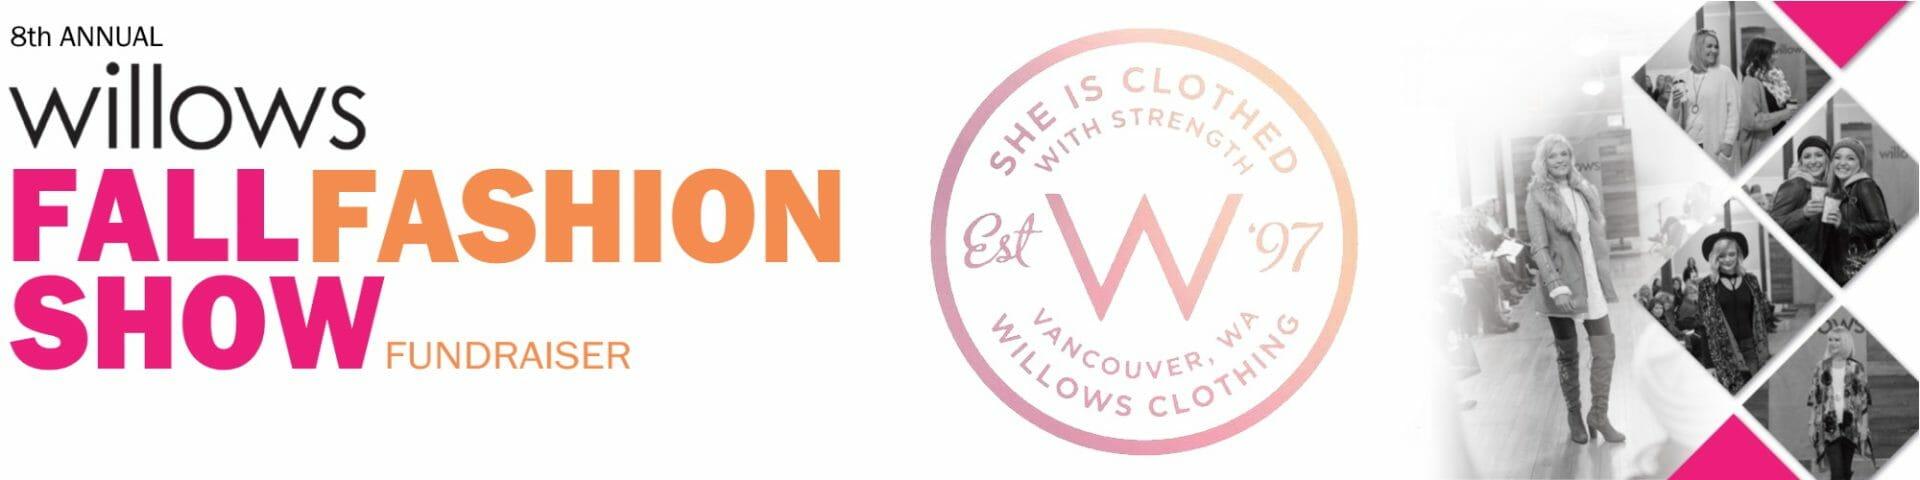 Willows Fall Fashion Show